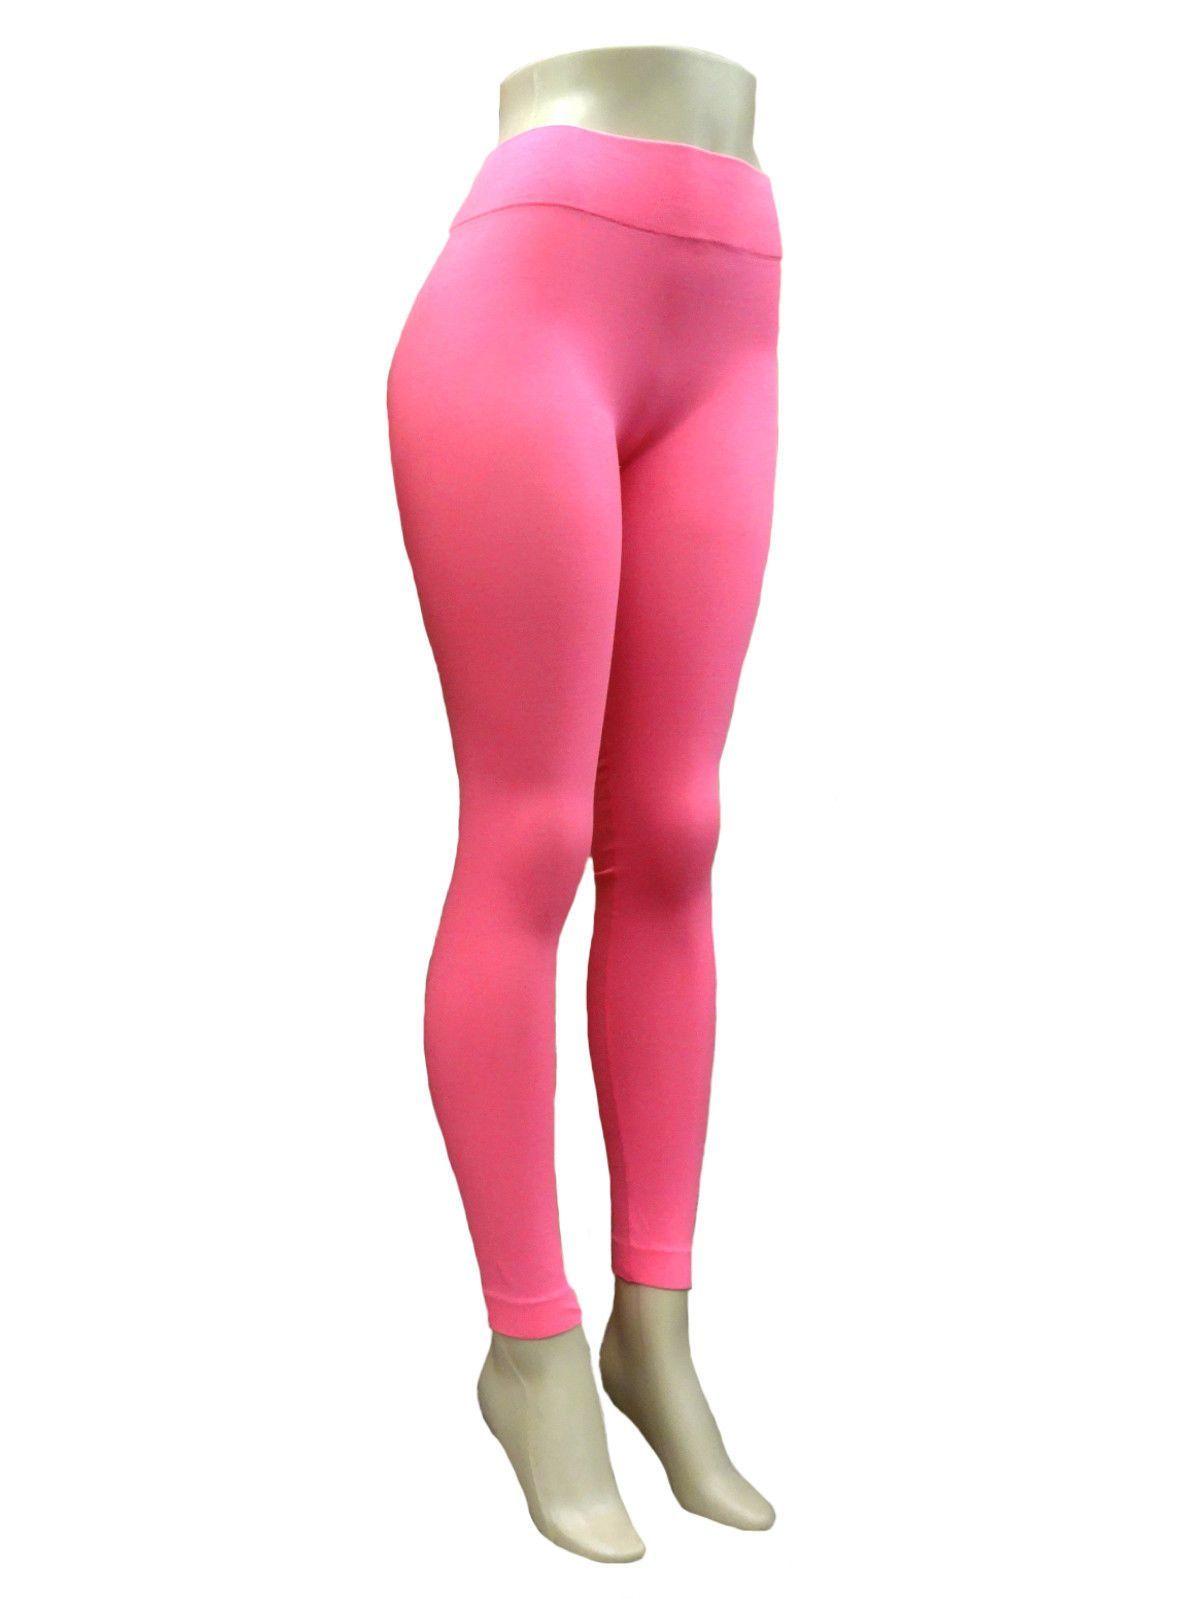 FREE SIZE Seamless Full Length Nylon Leggings Workout Stretch Skinny Pants